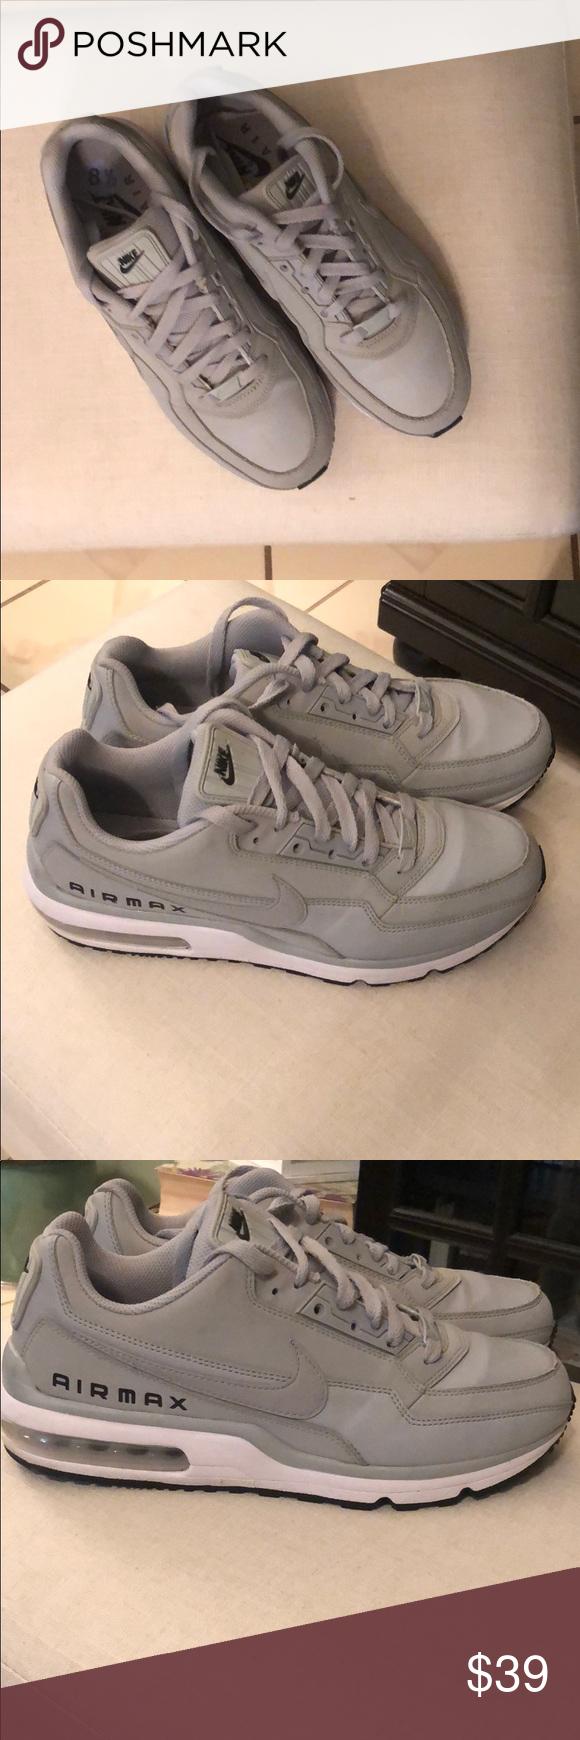 Light grey nike shoes, Gray nike shoes